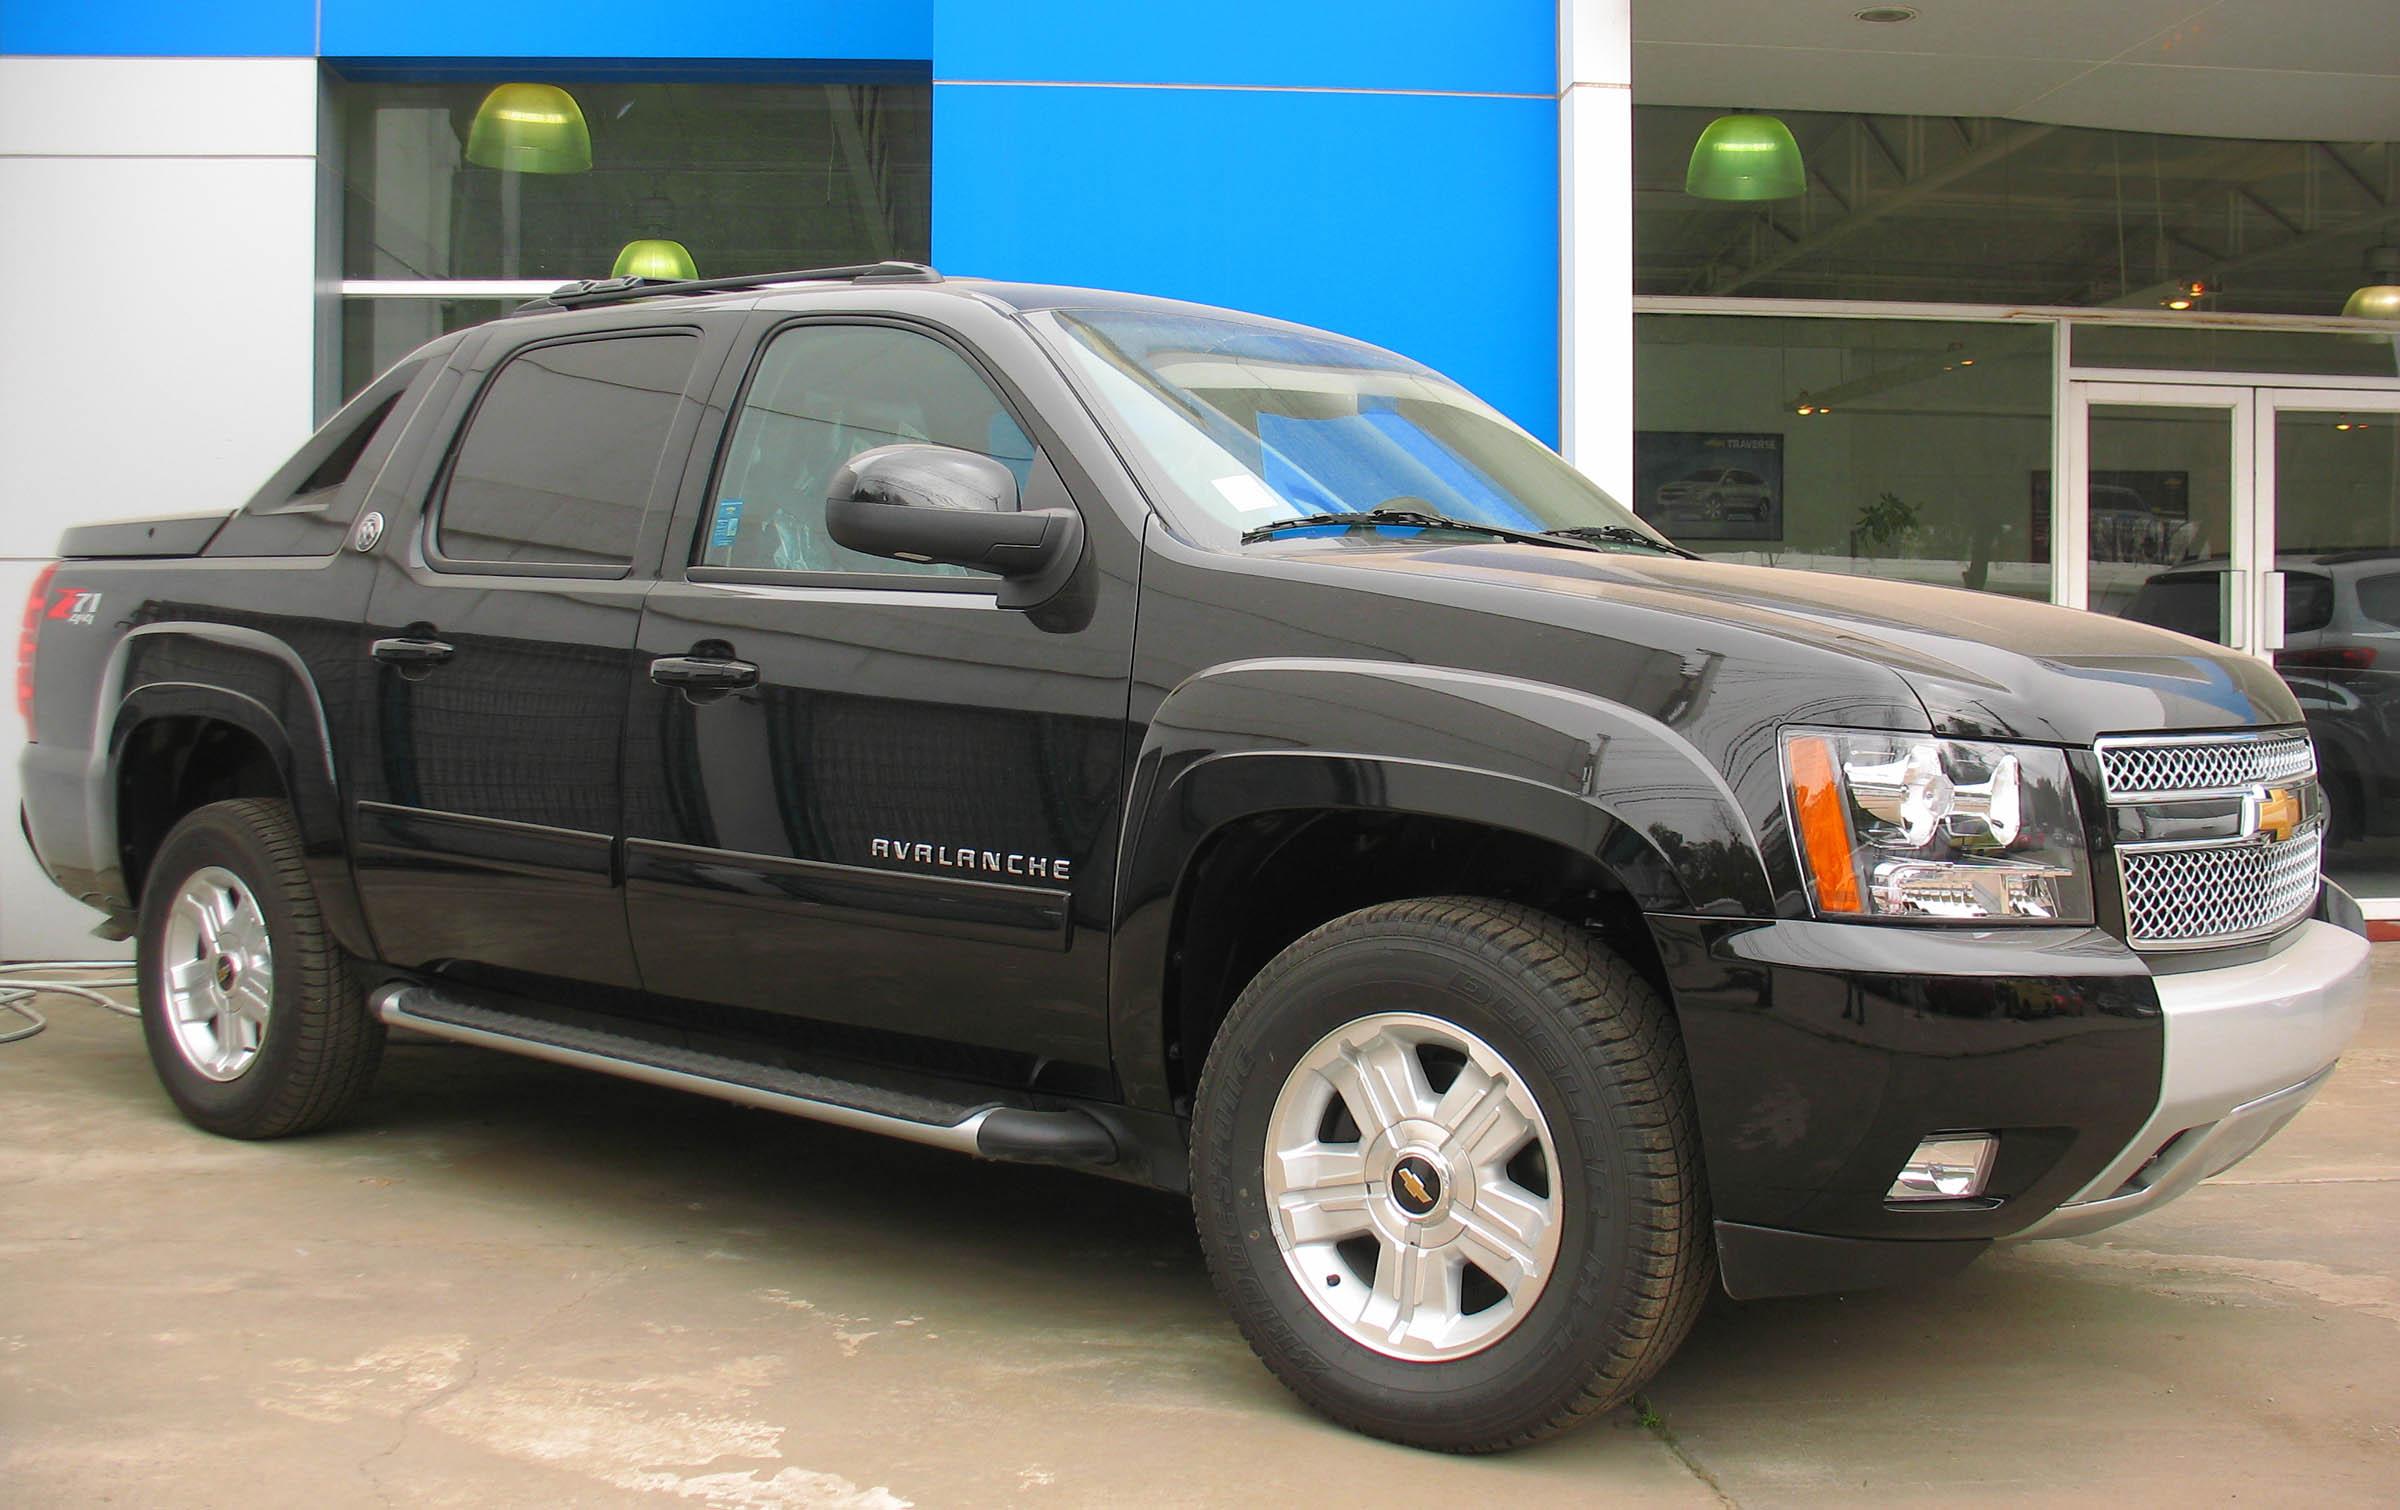 Chevrolet Avalanche II 2006 - 2013 Pickup #6